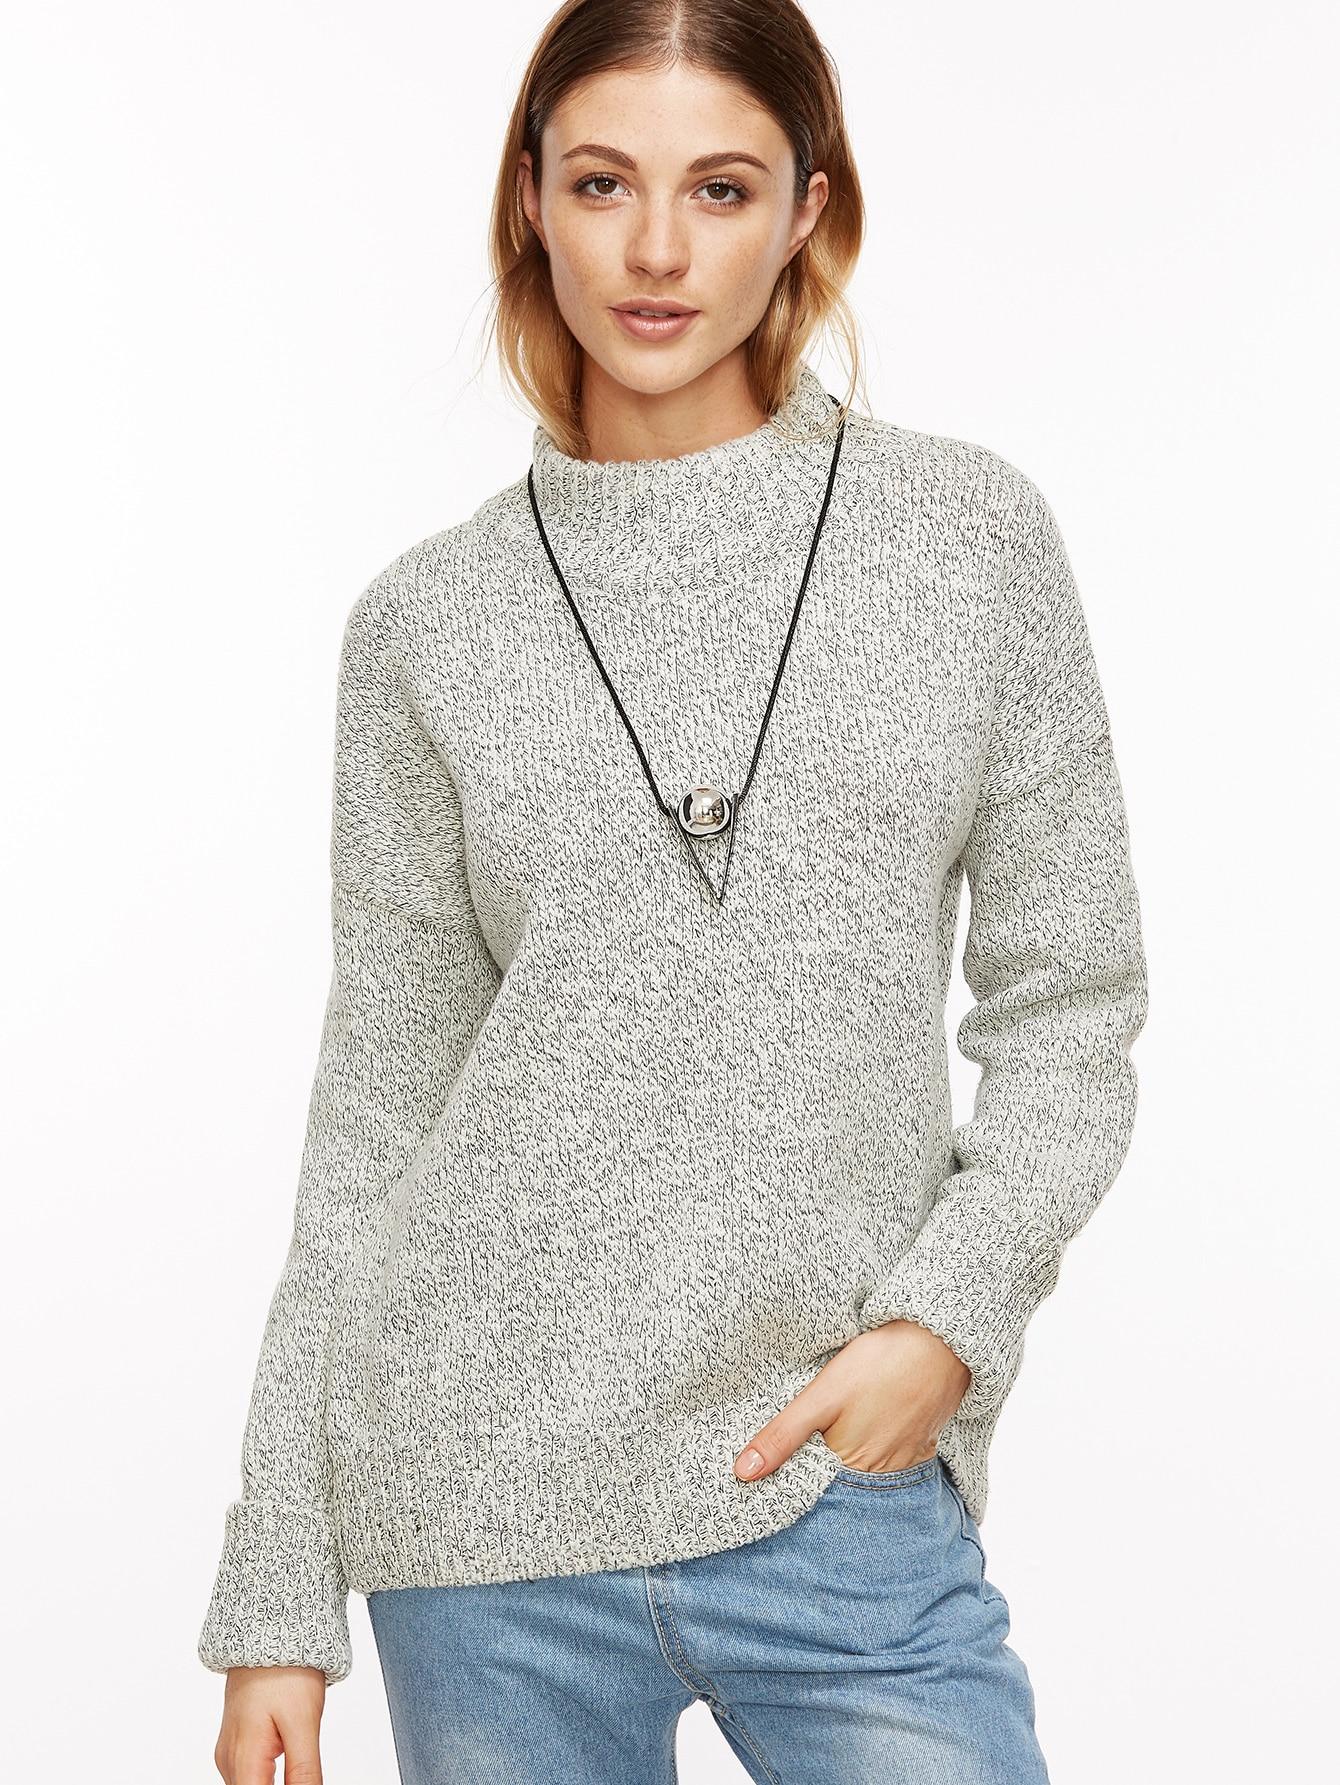 Heather Grey Drop Shoulder Cuffed Sweater sweater161031115